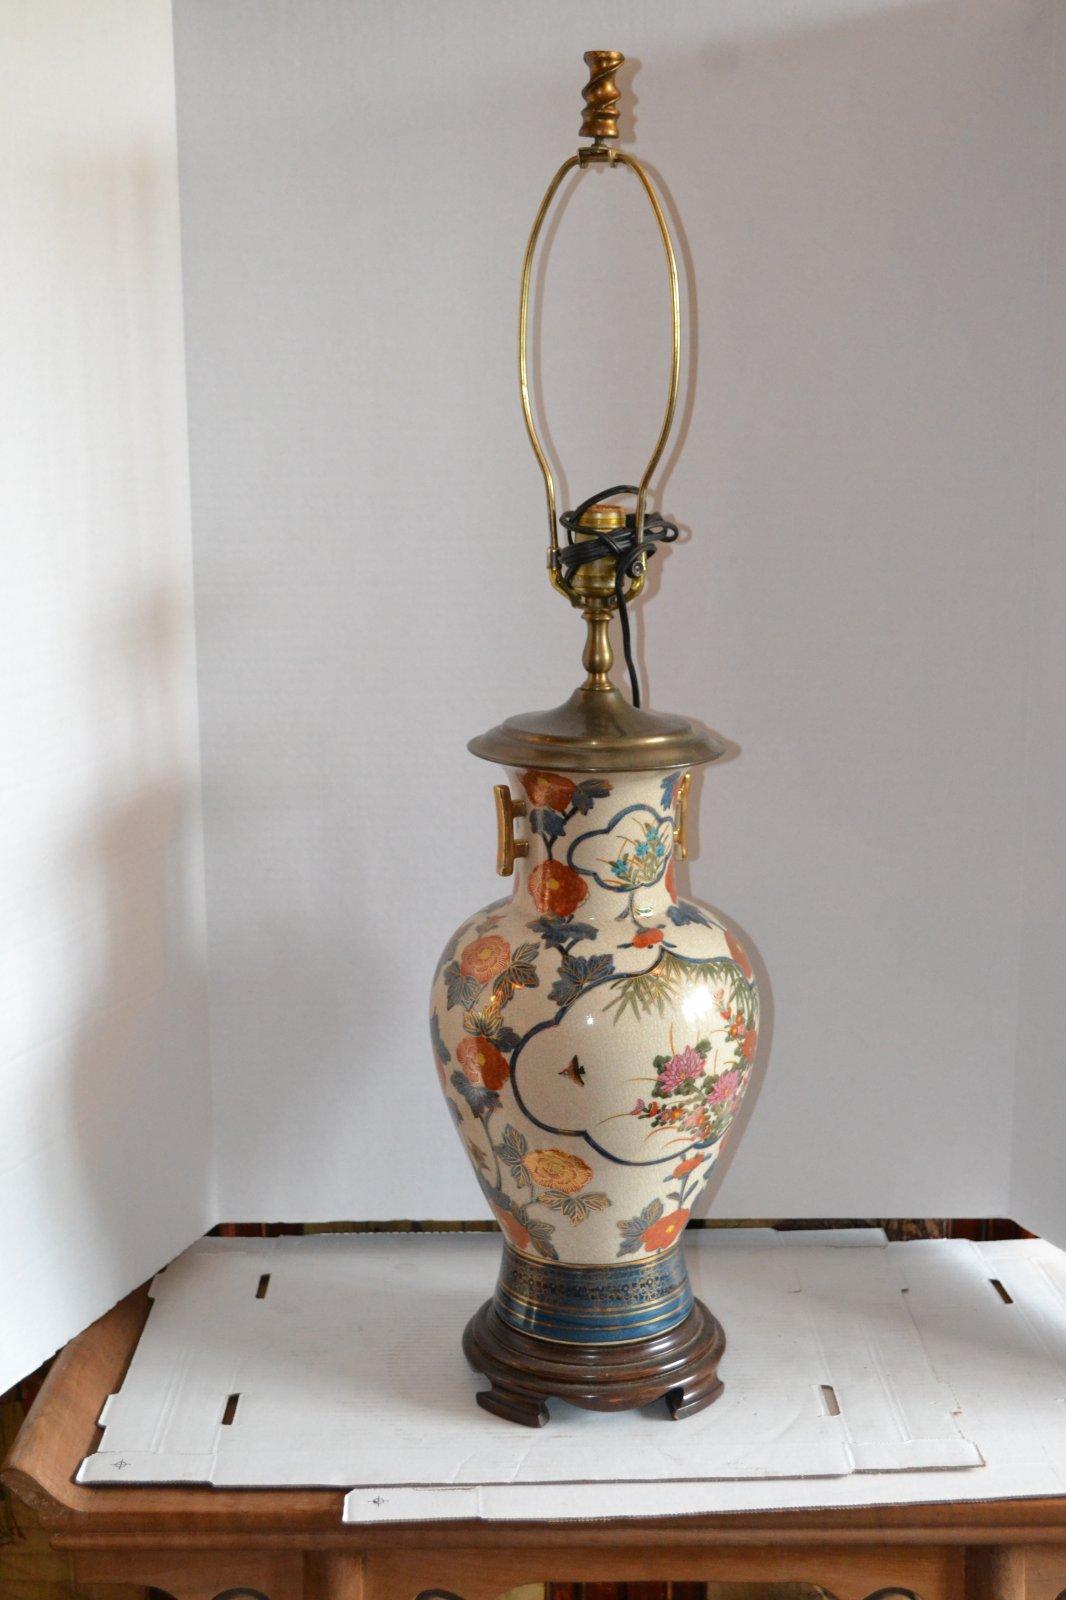 20th Century Decorative Art crackle glazed porcelain lamp wooden base, greenish color H. 27 X W. 9